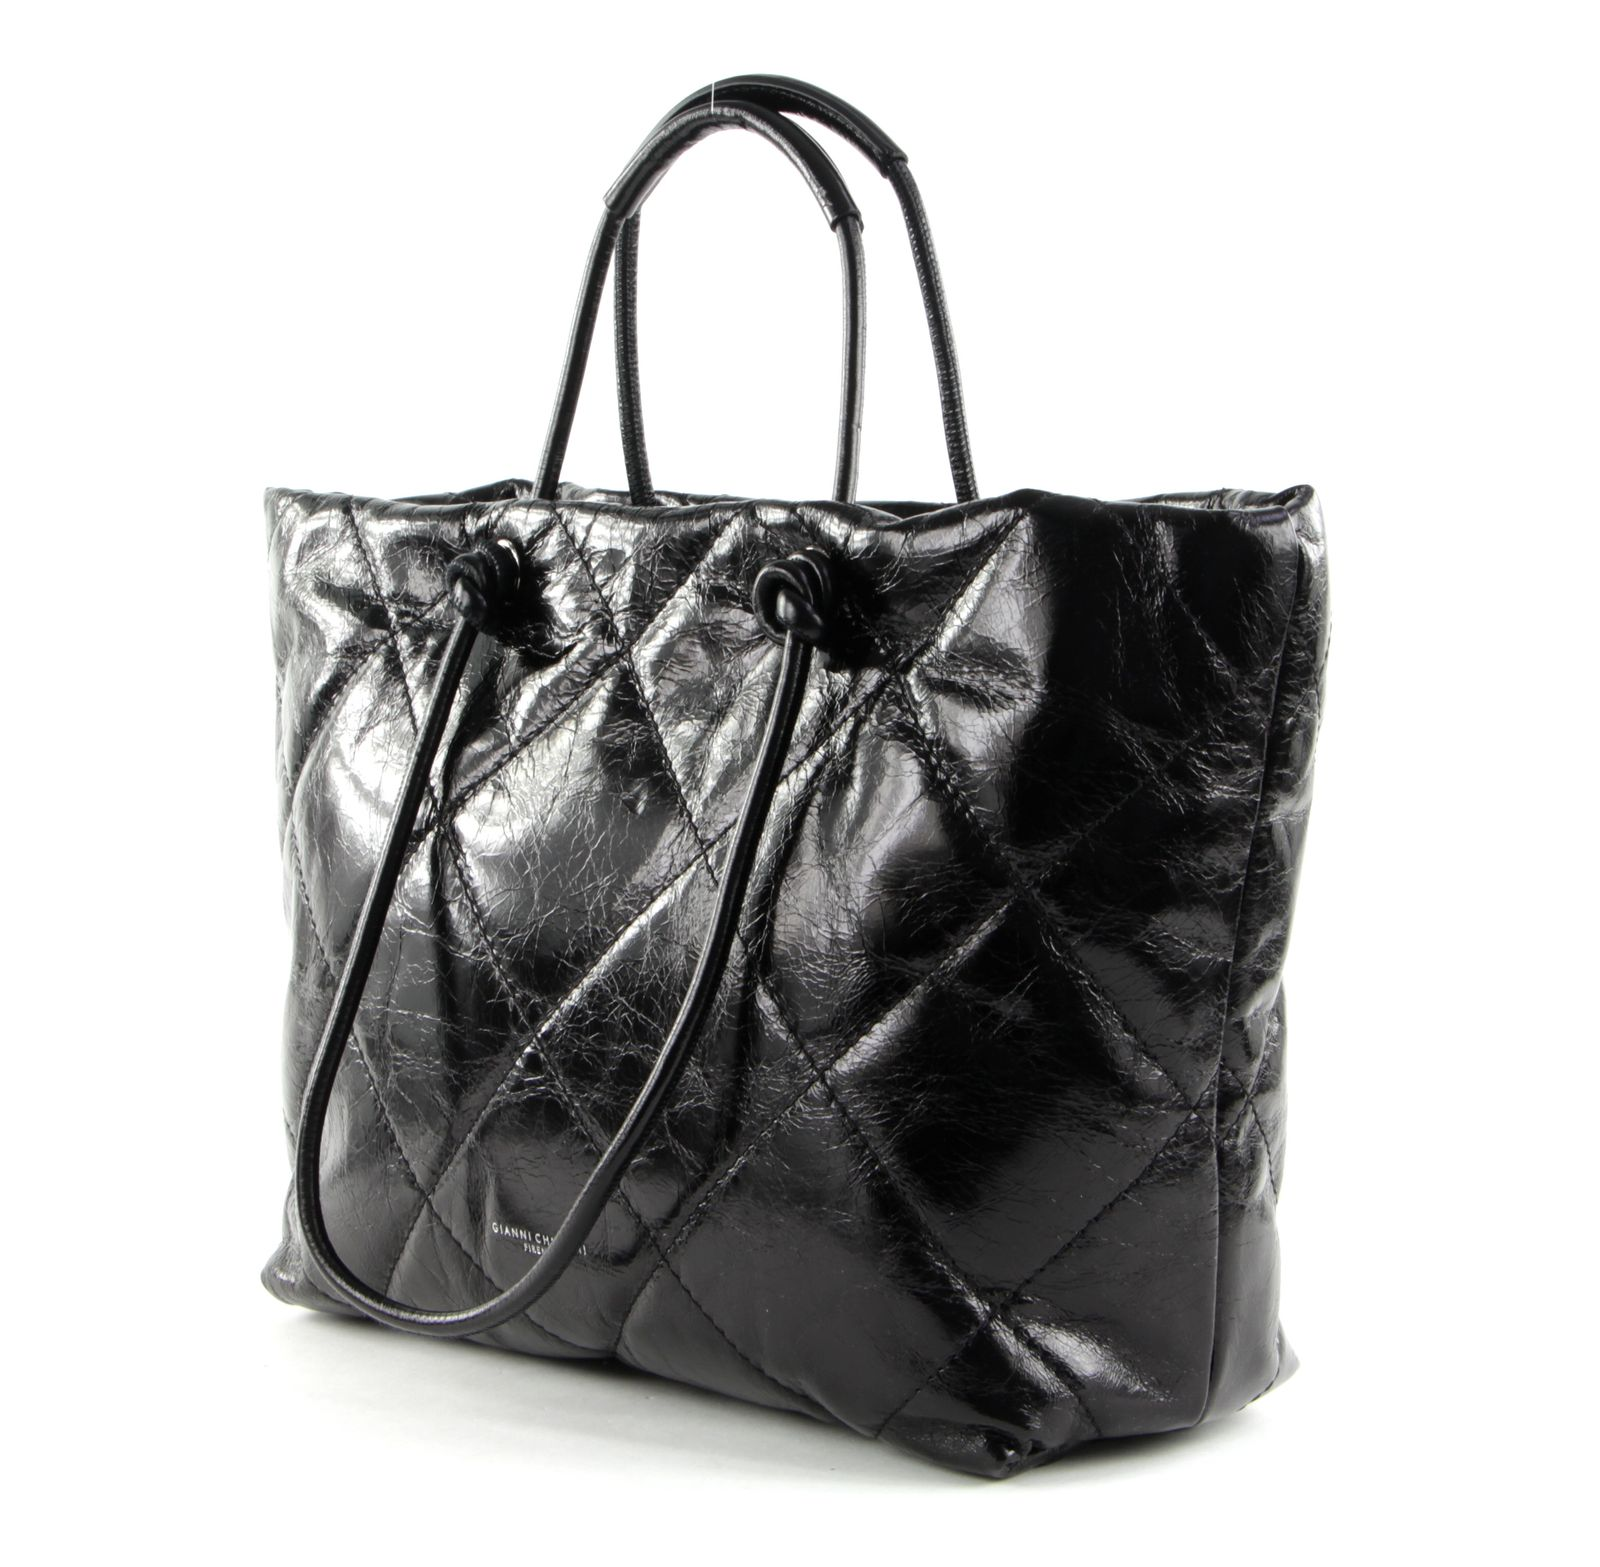 GIANNI CHIARINI Kate Handbag Nero